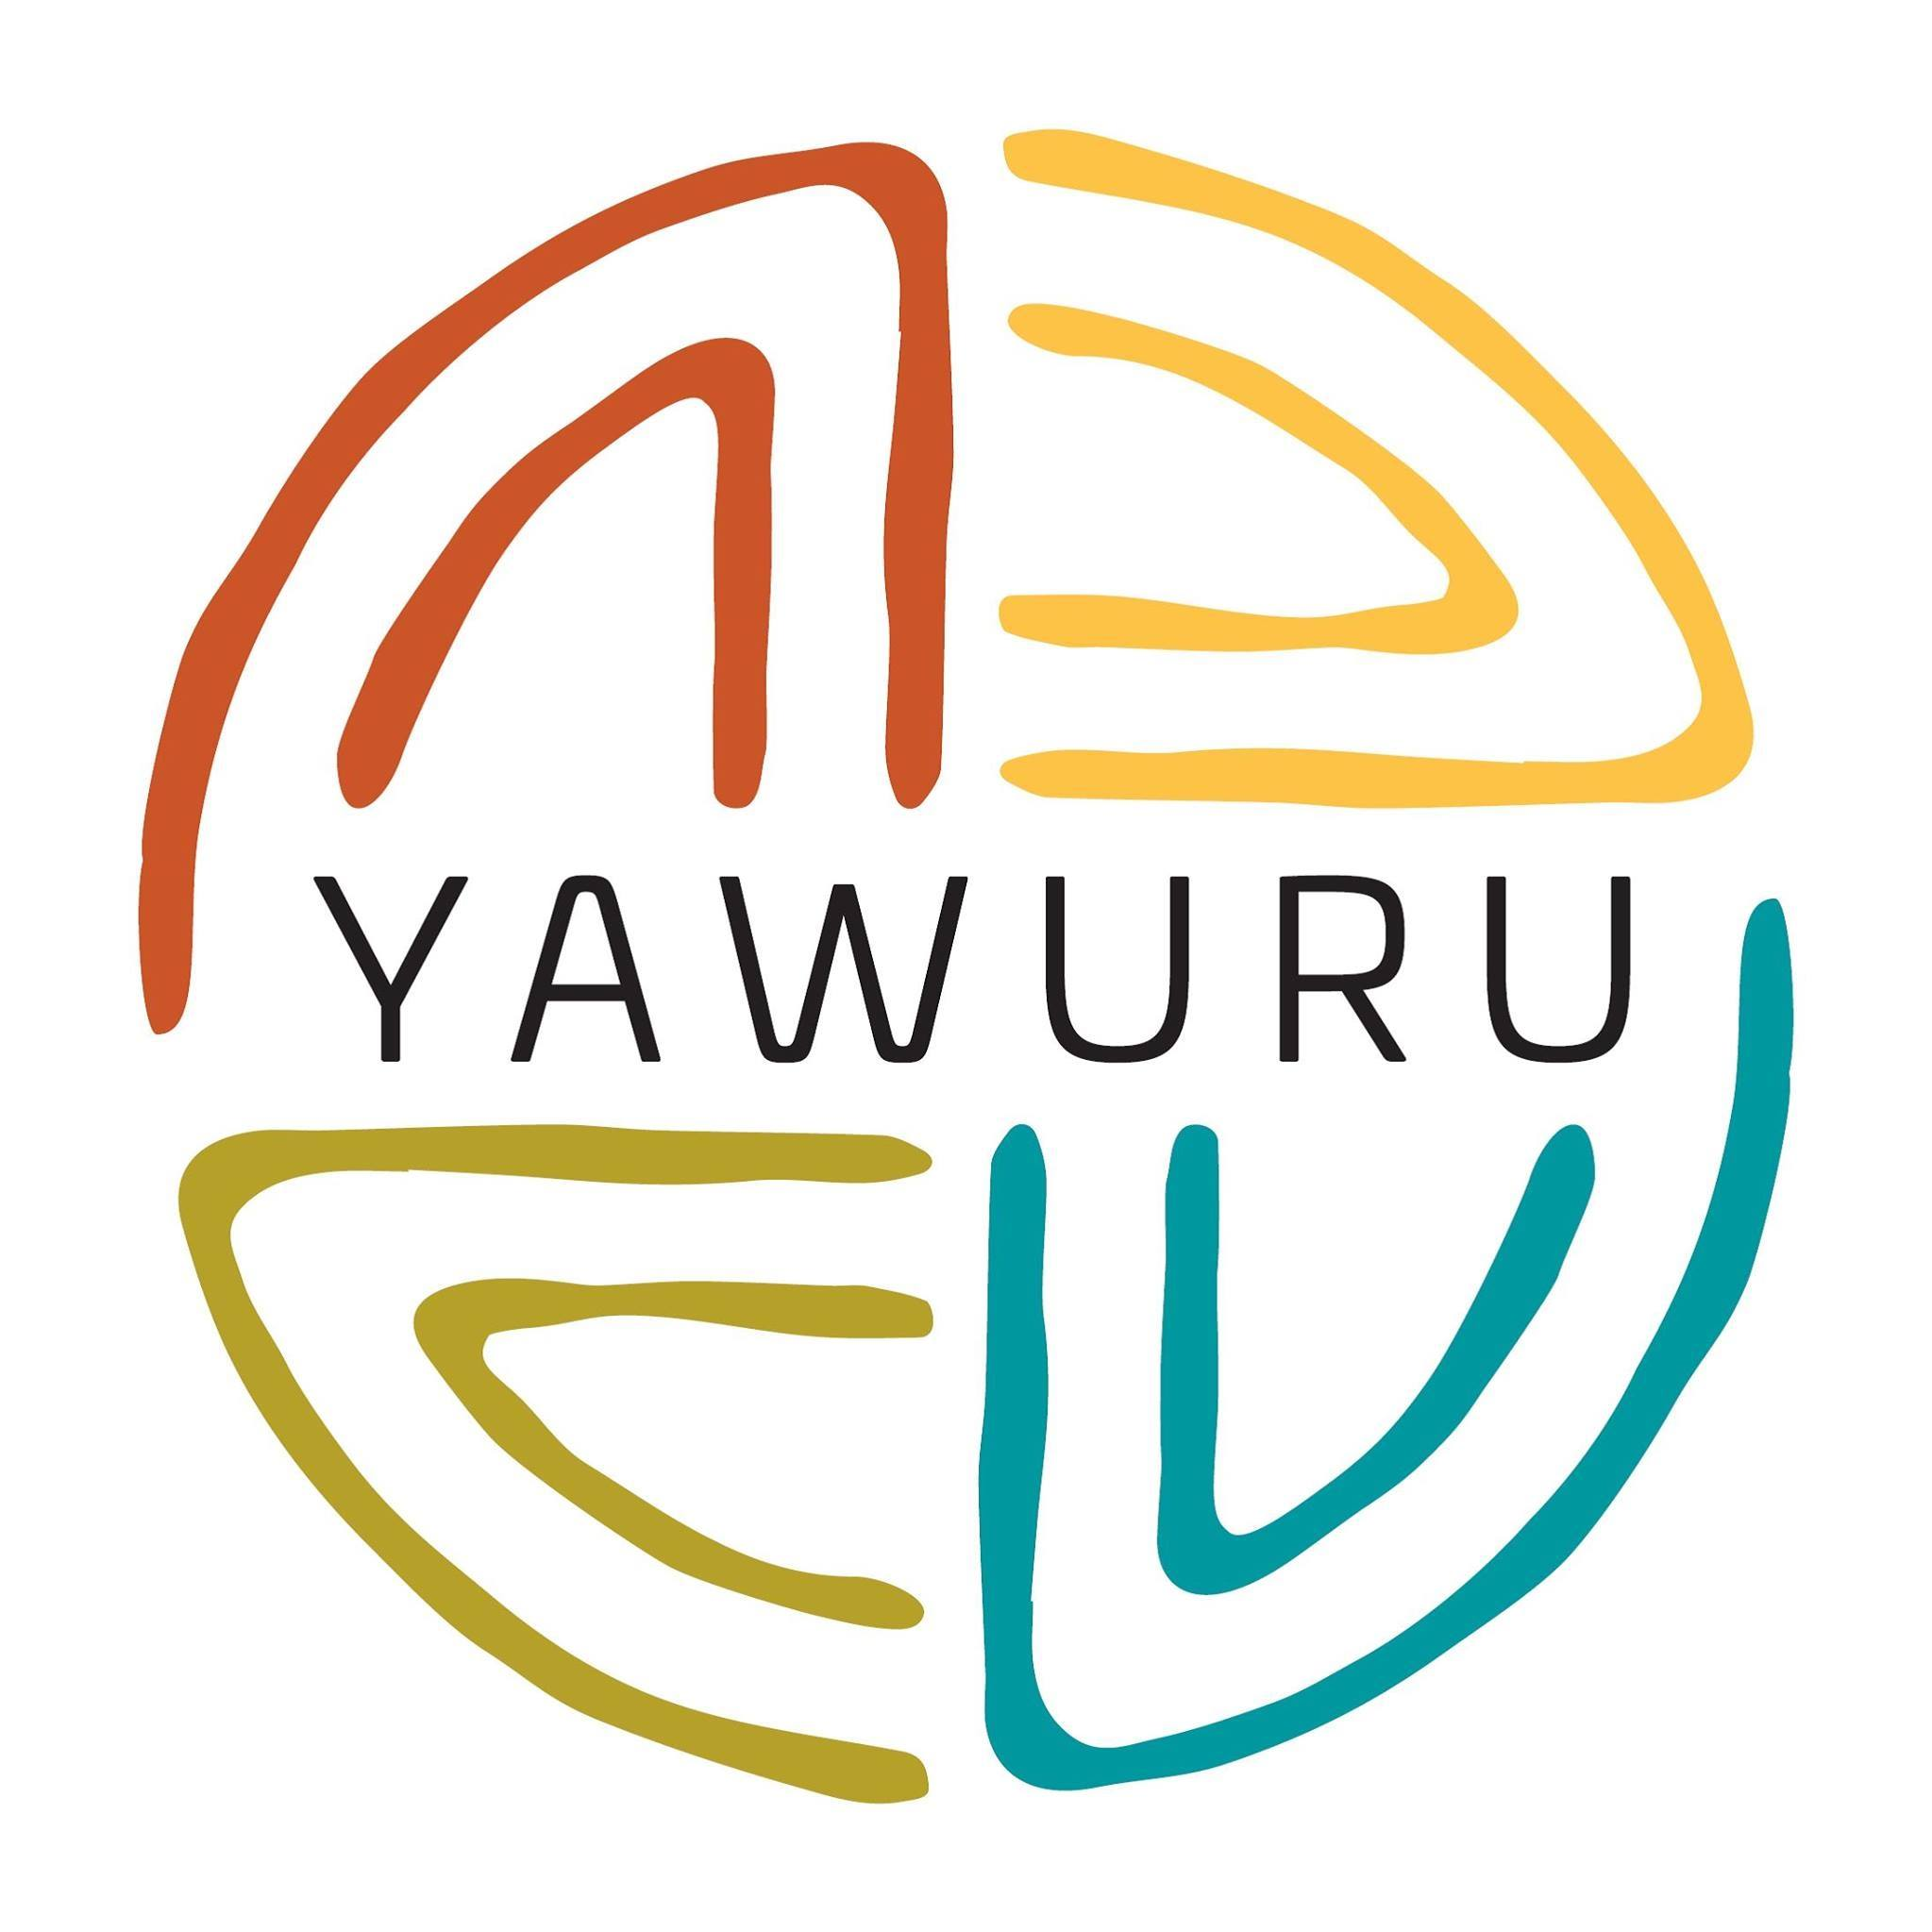 Community-driven empowerment through mabu liyan – closing the data and knowledge gap